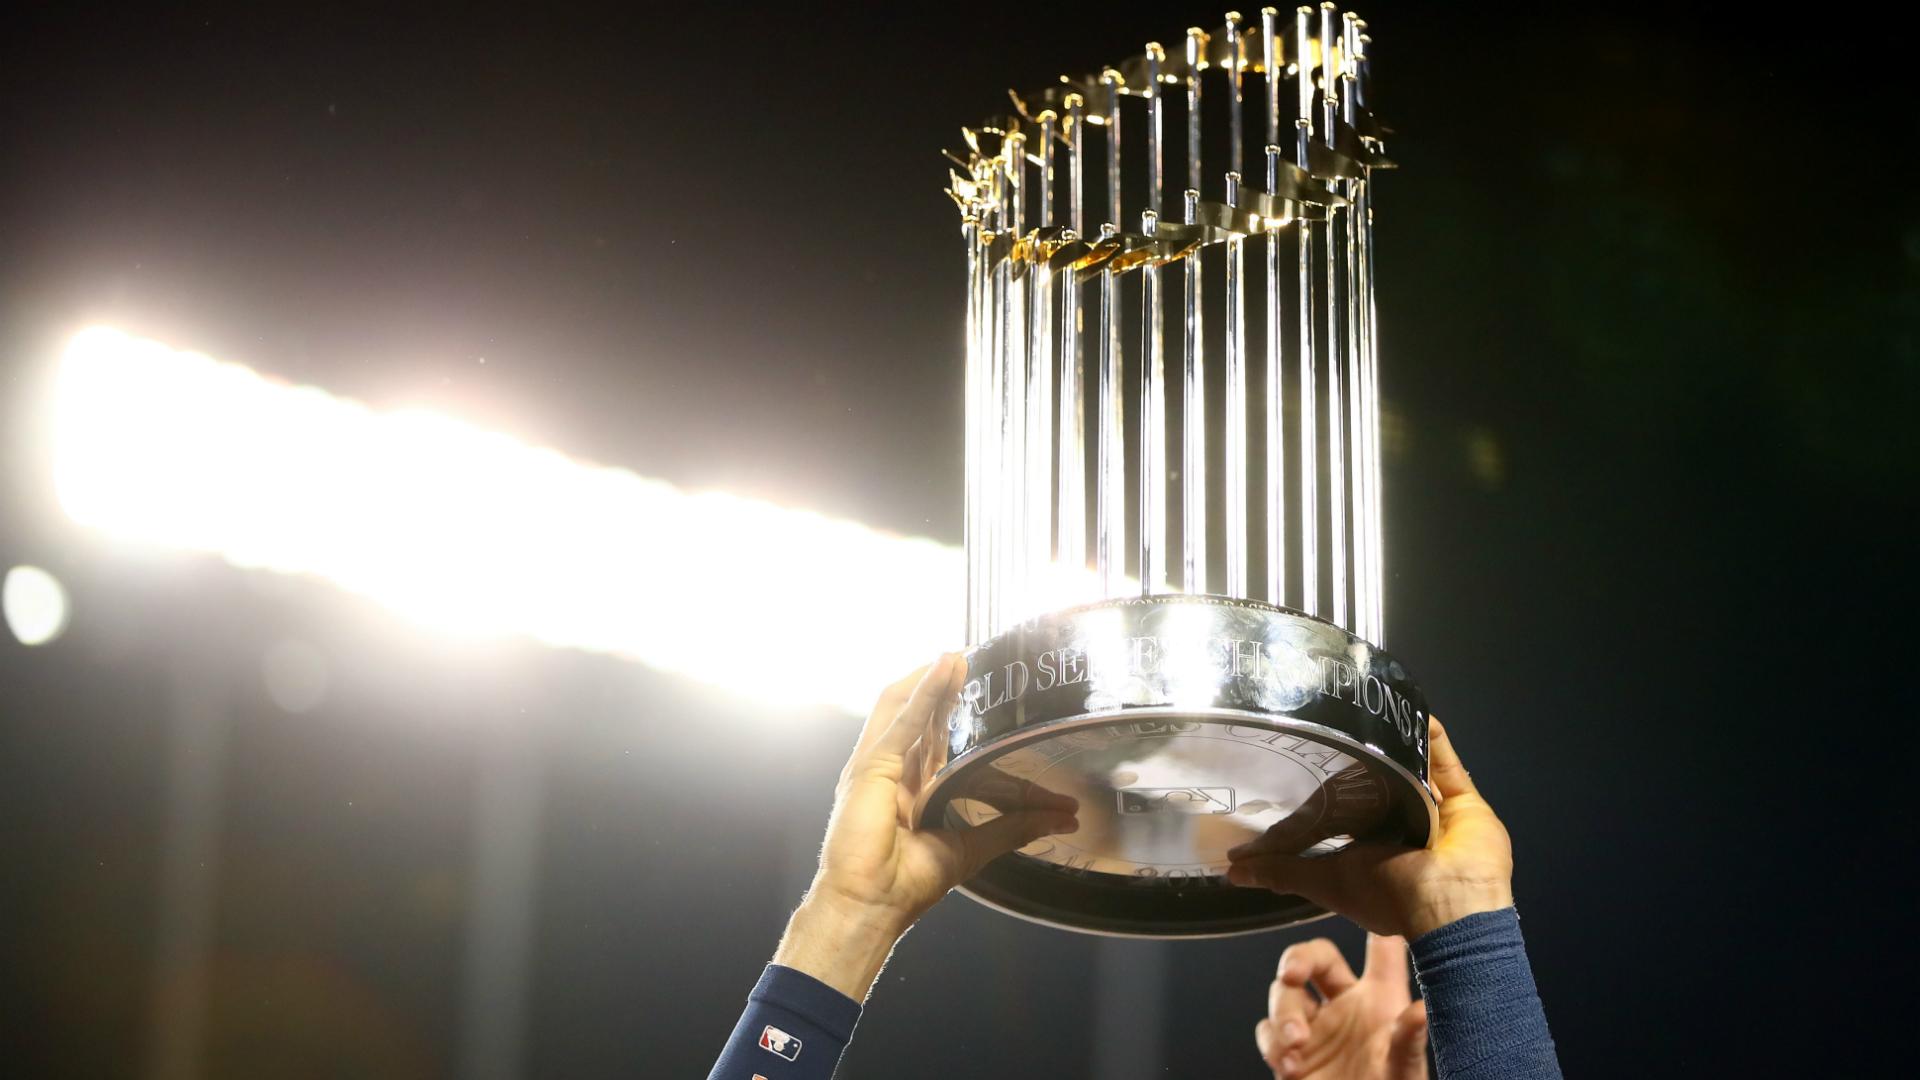 www.sportingnews.com